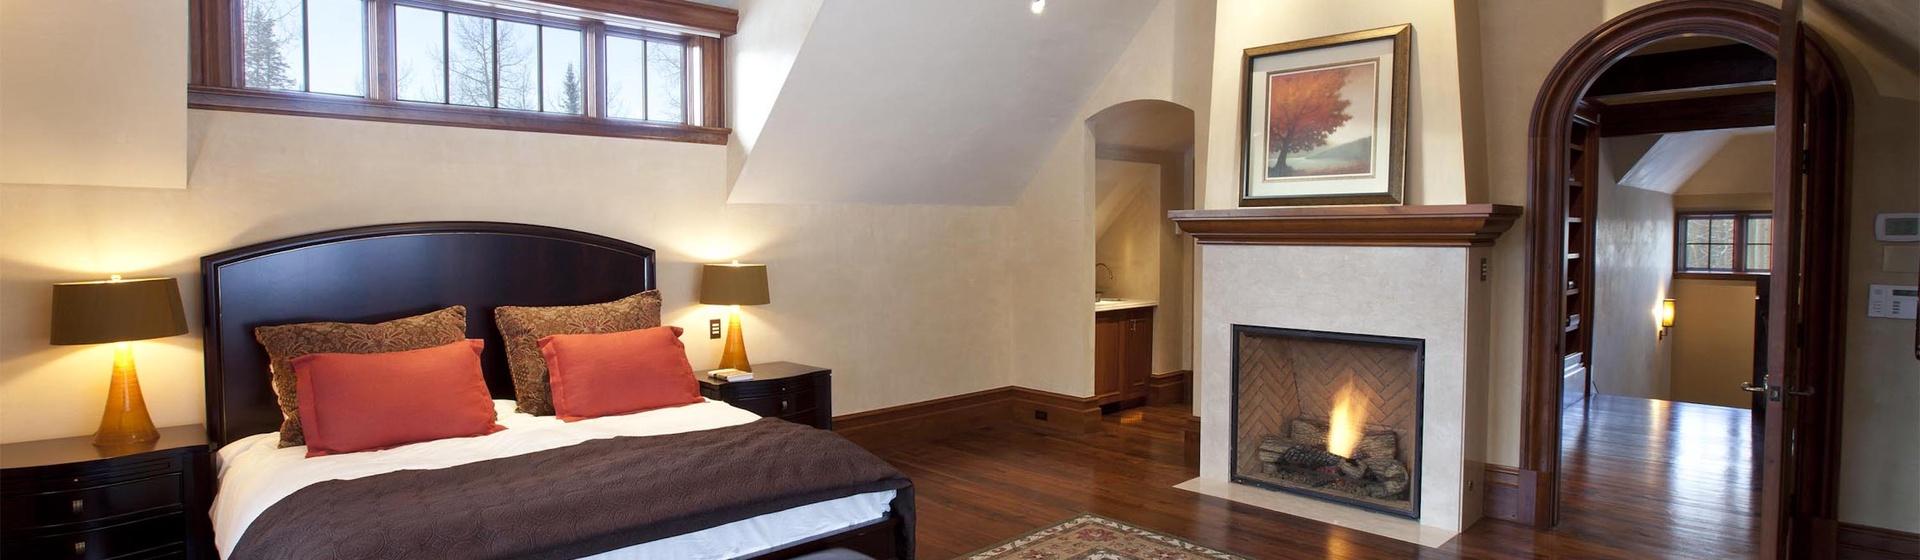 5.02-mountain-village-hood-park-manor-master-bedroom-a-2-track.jpg